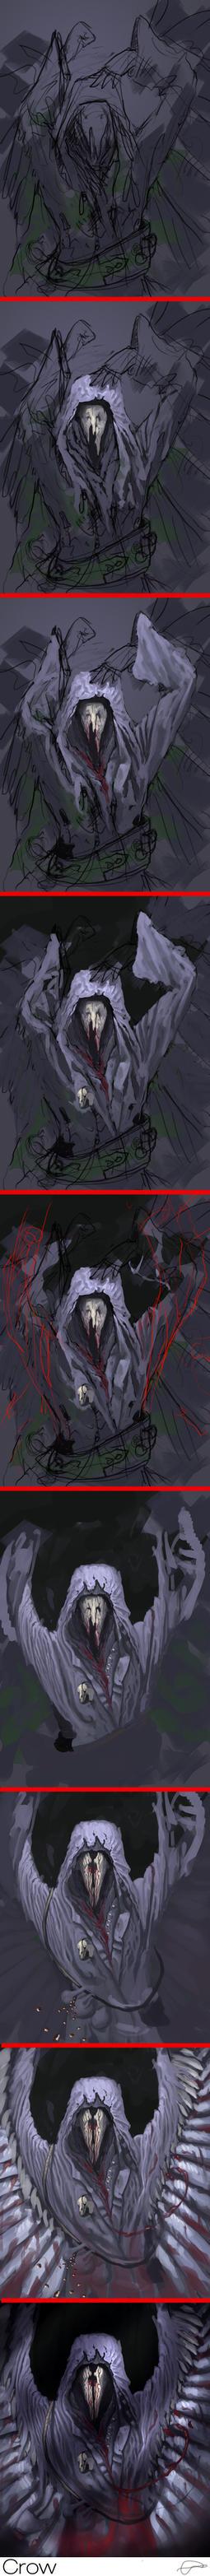 Mortanas The Crow Process by CrayonMechanic